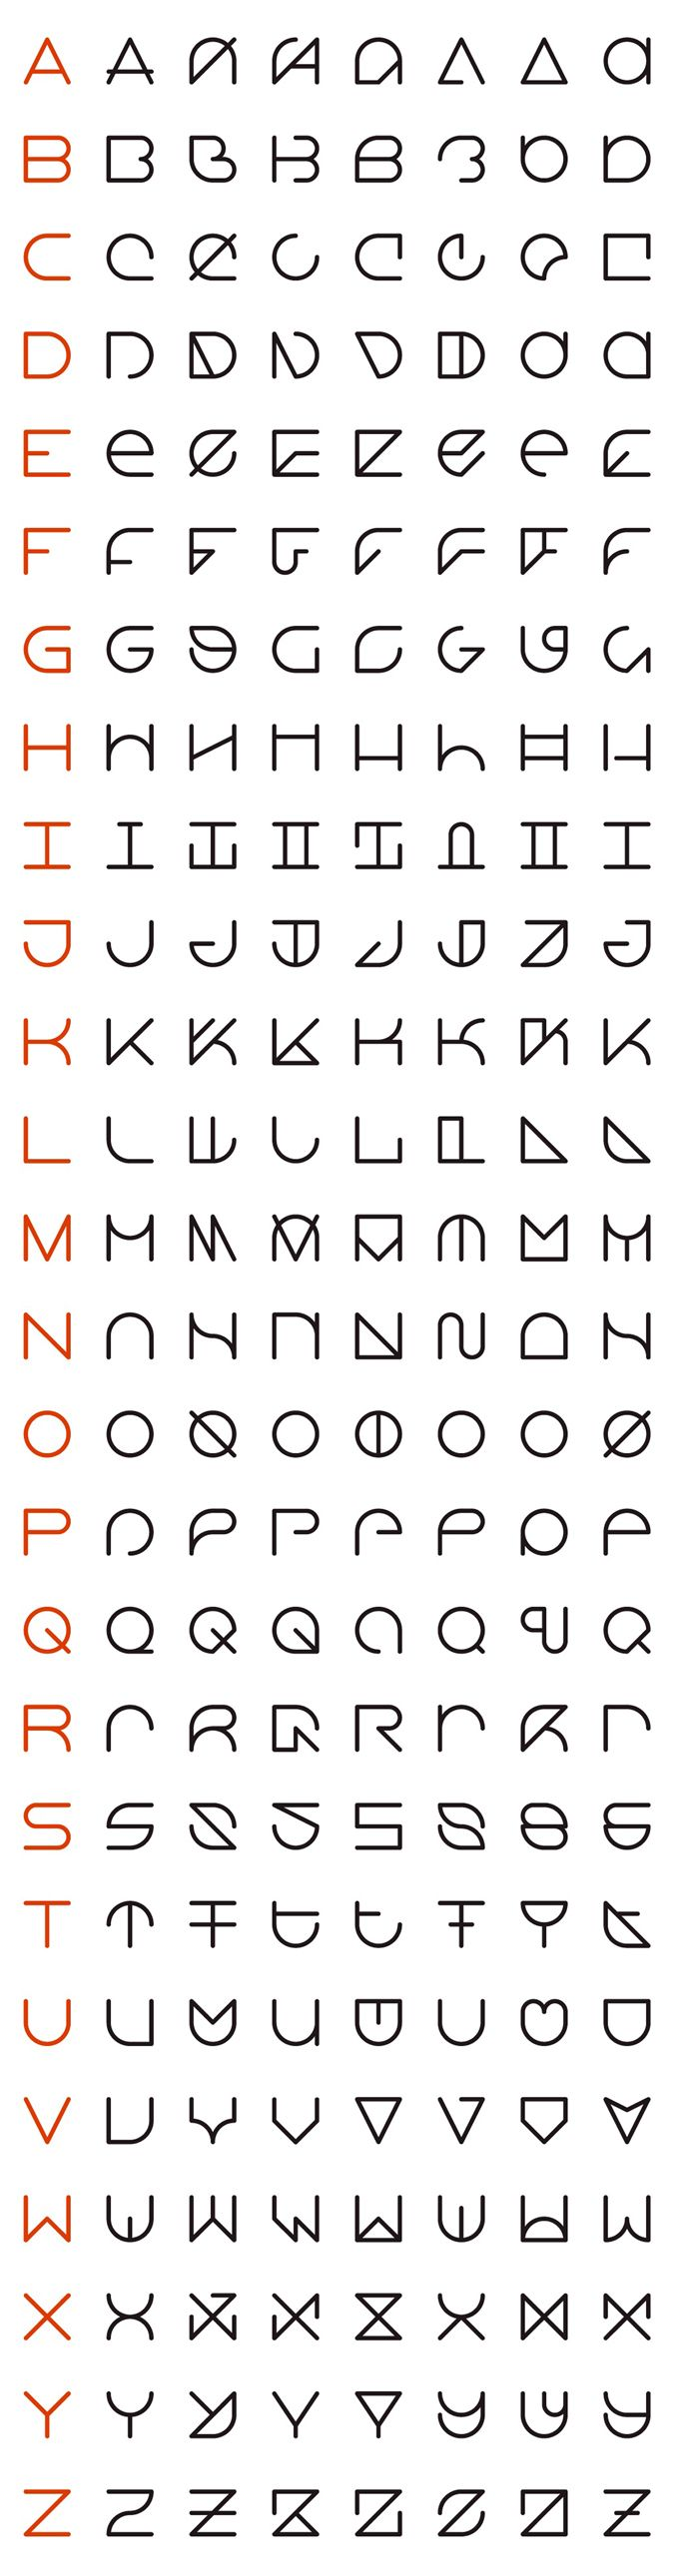 An Interview with Rolando G. Alcantara, Typographic Innovator